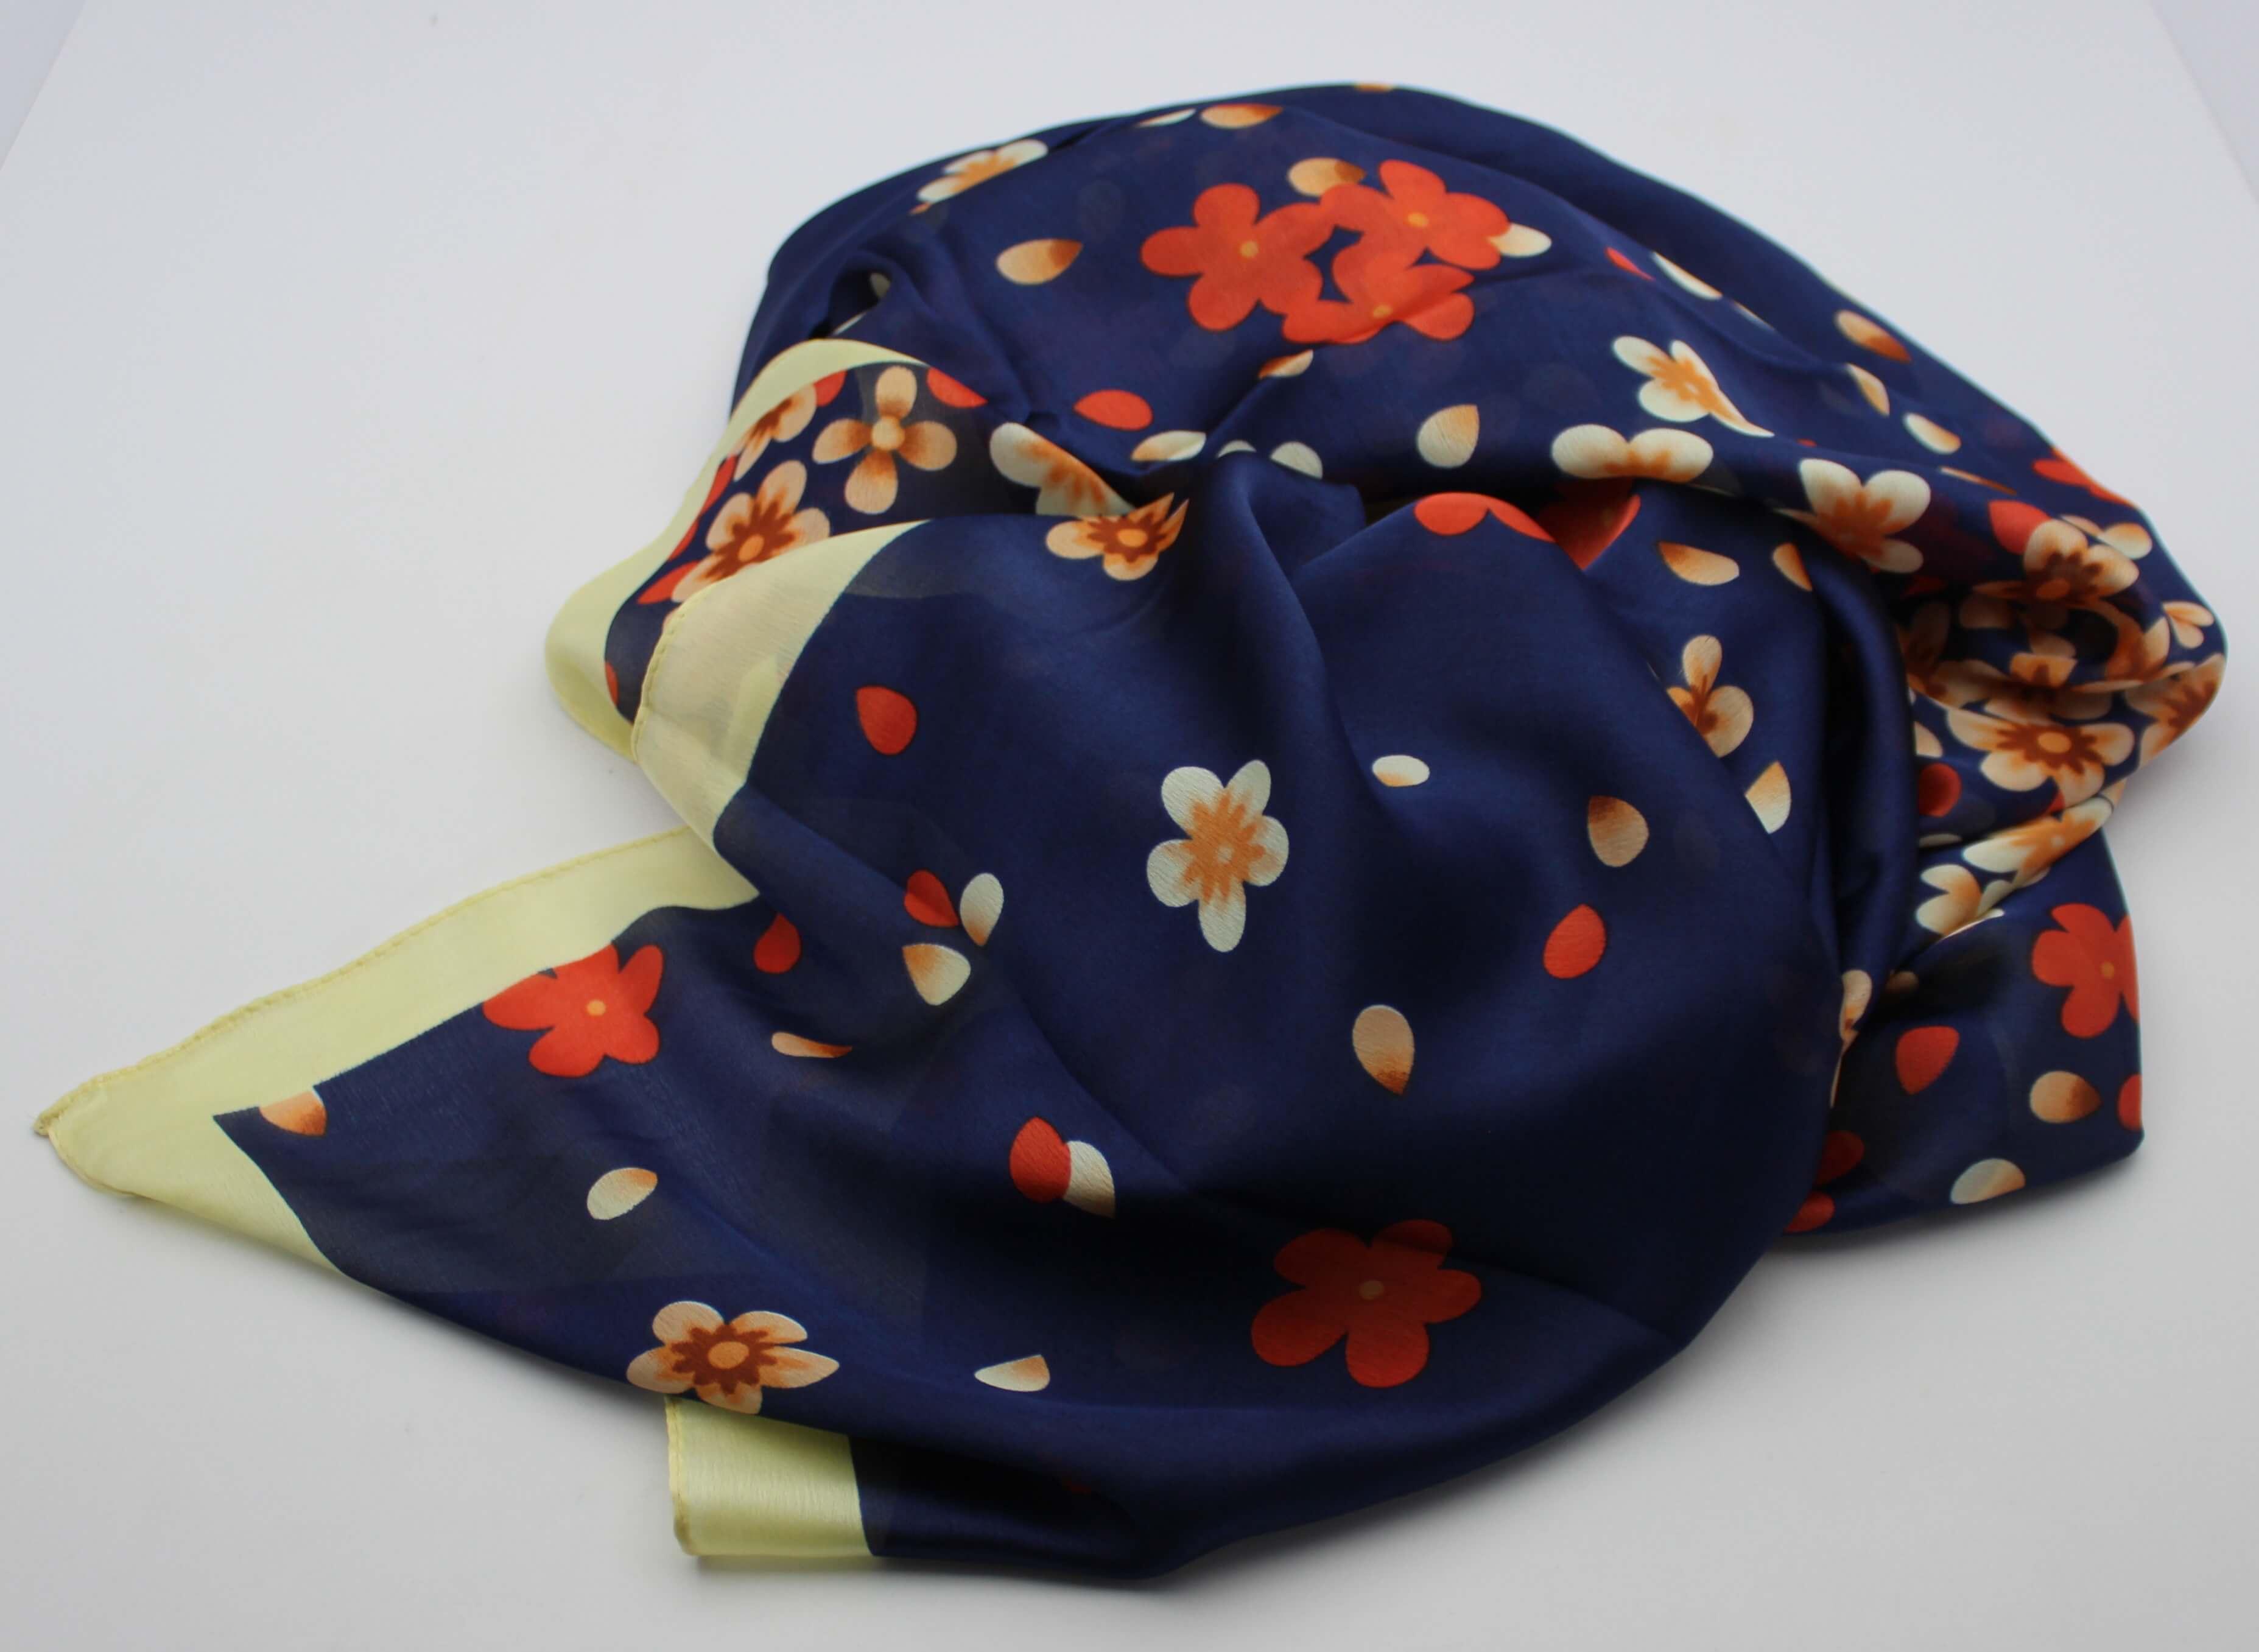 99201fee69a Hedvábný šátek modrý s puntíkama